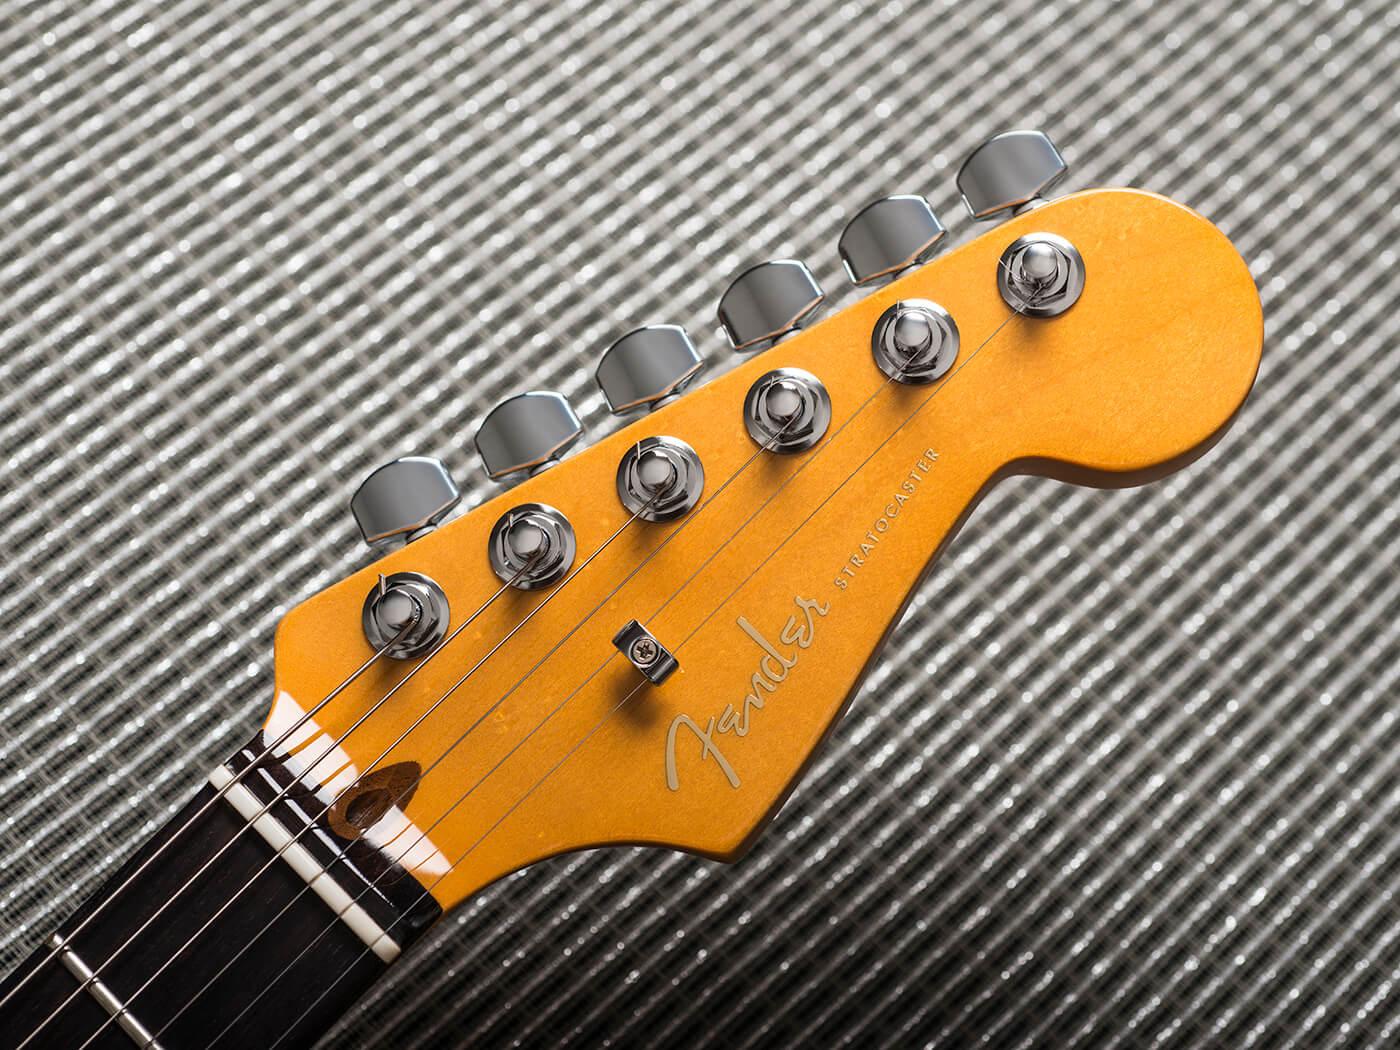 Fender American Ultra Stratocaster (Headstock)